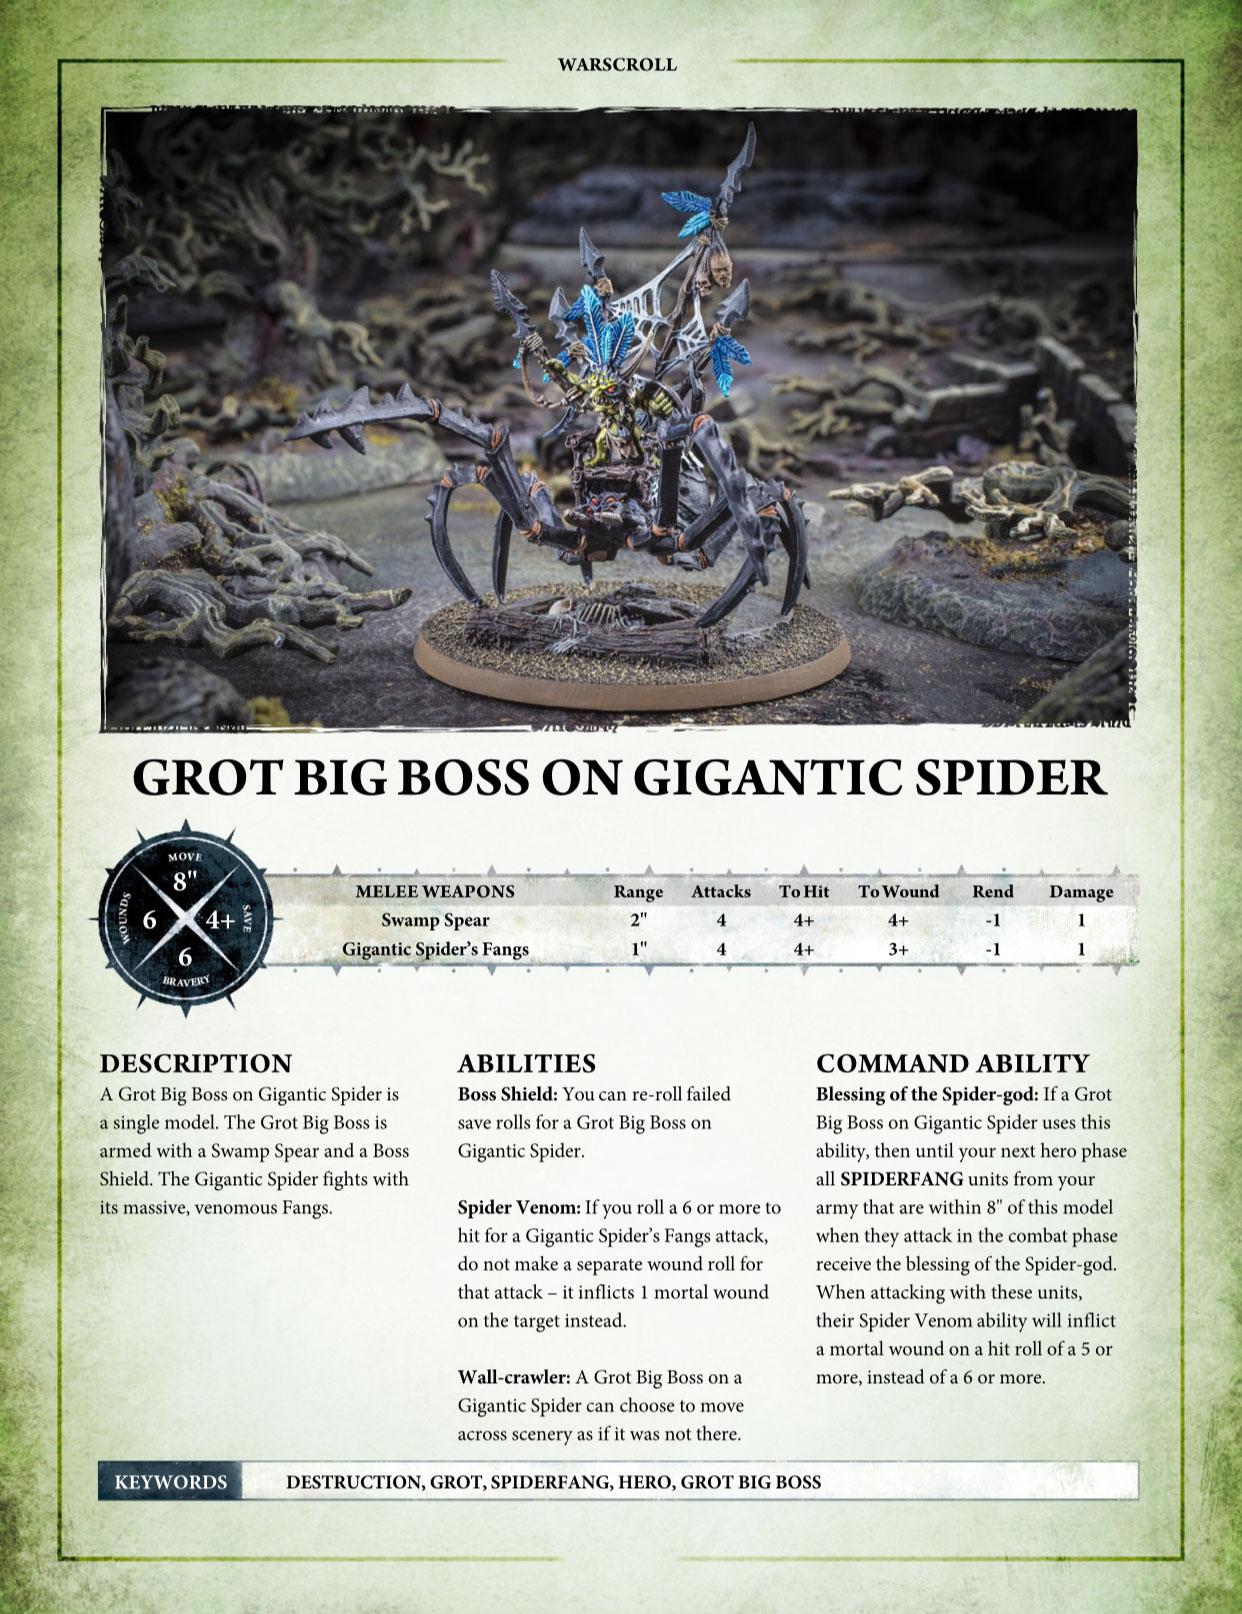 grot-big-boss-gigantic-spider-scroll